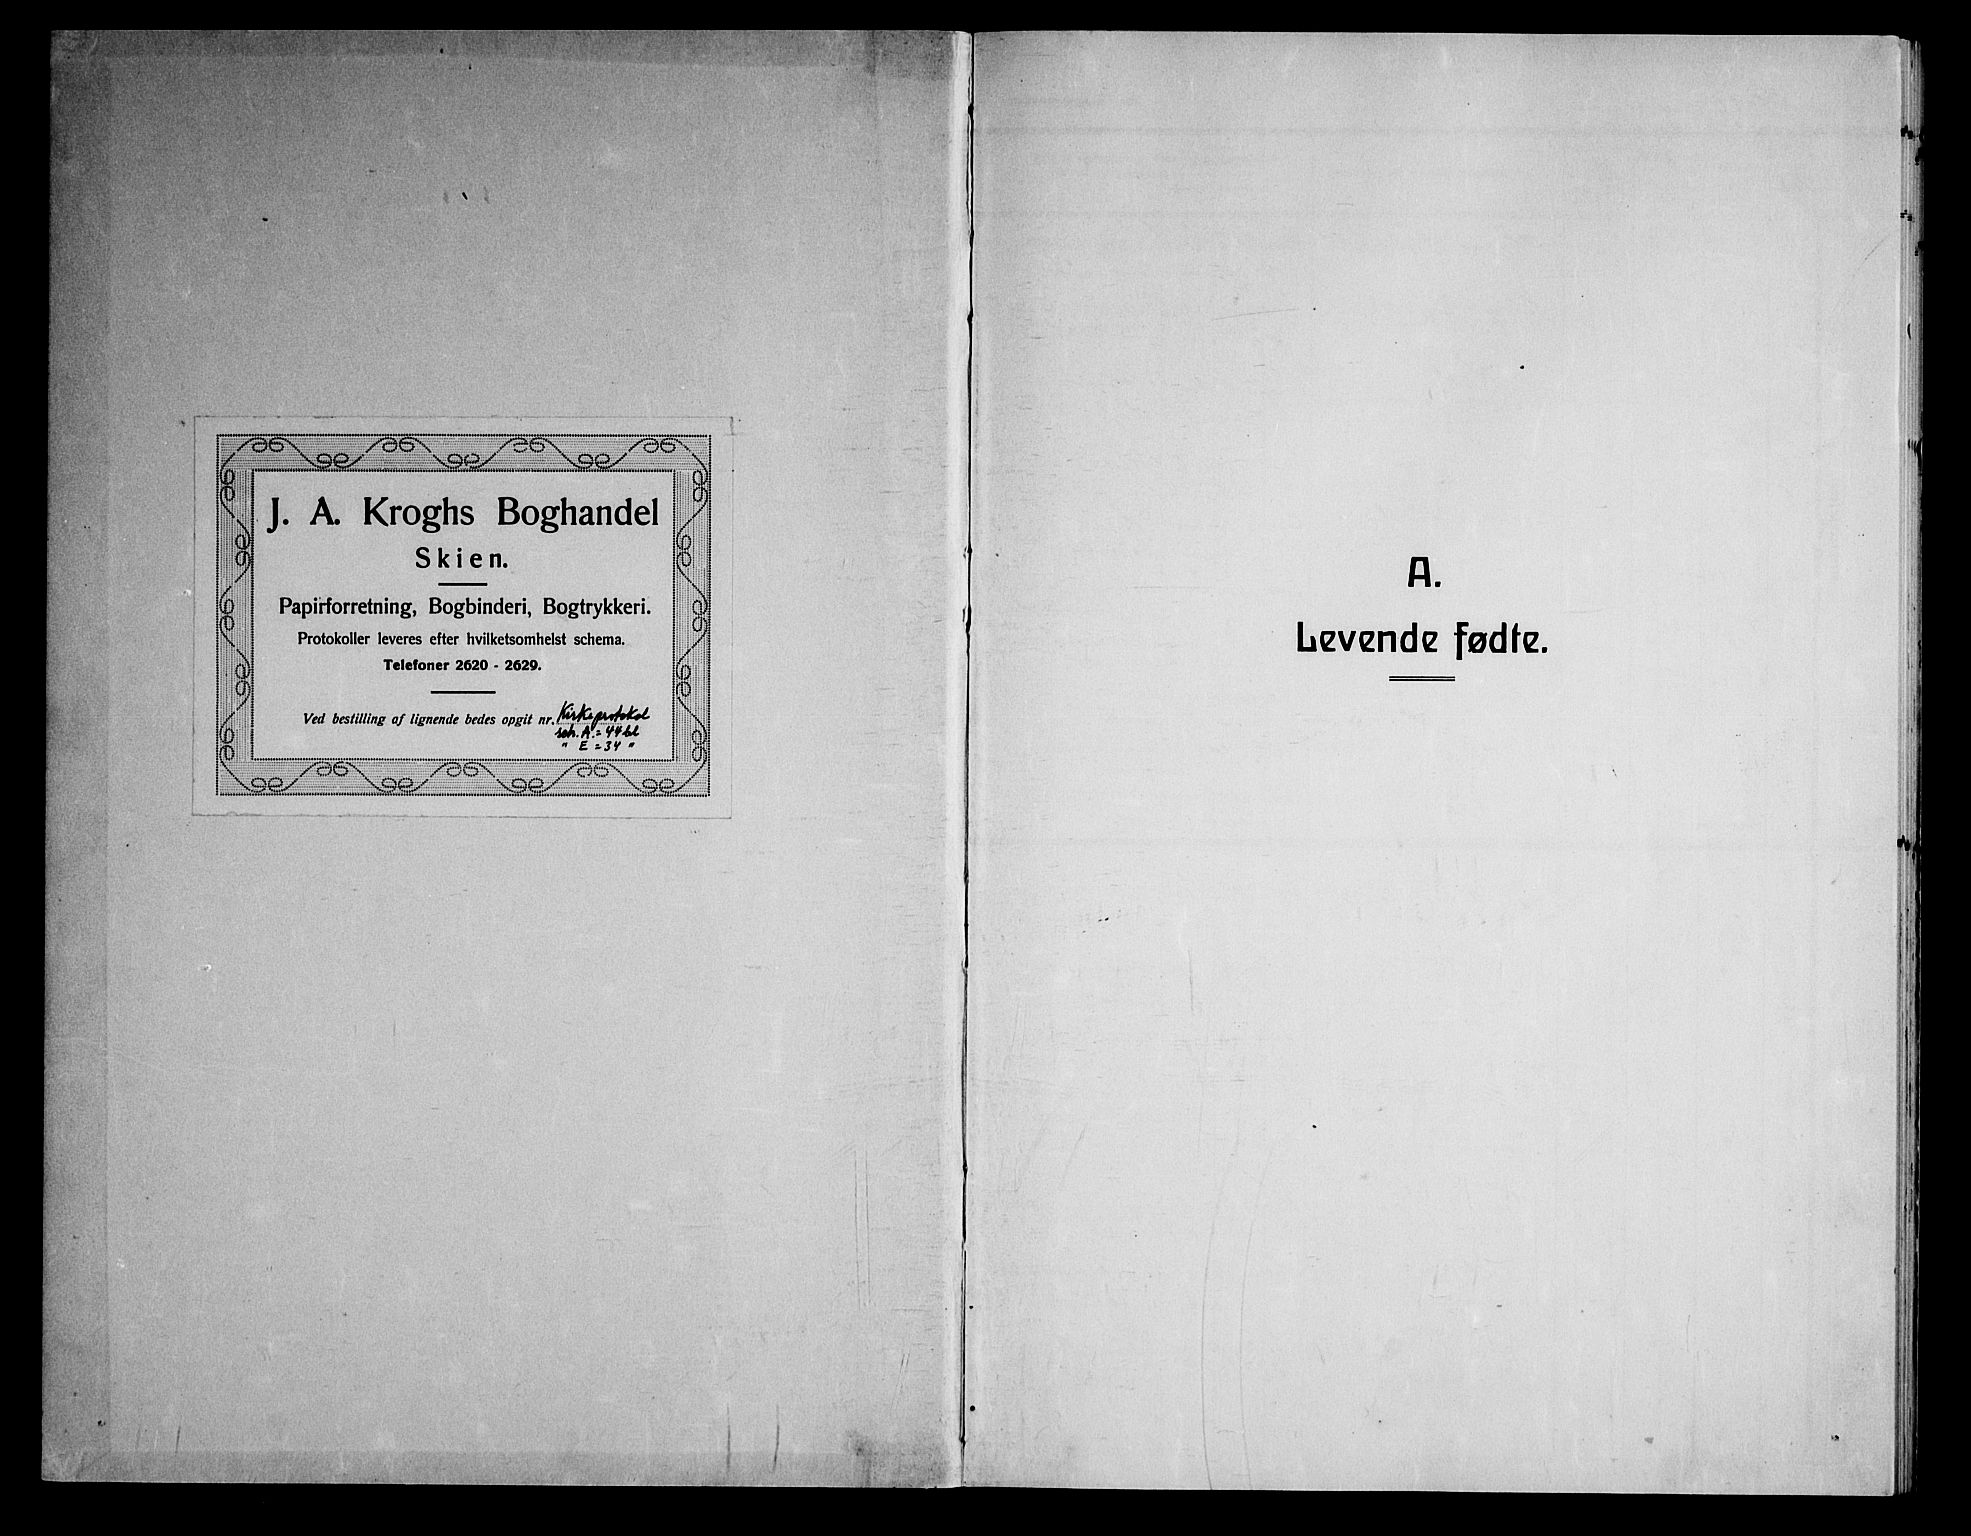 SAKO, Nissedal kirkebøker, G/Gb/L0004: Klokkerbok nr. II 4, 1929-1966